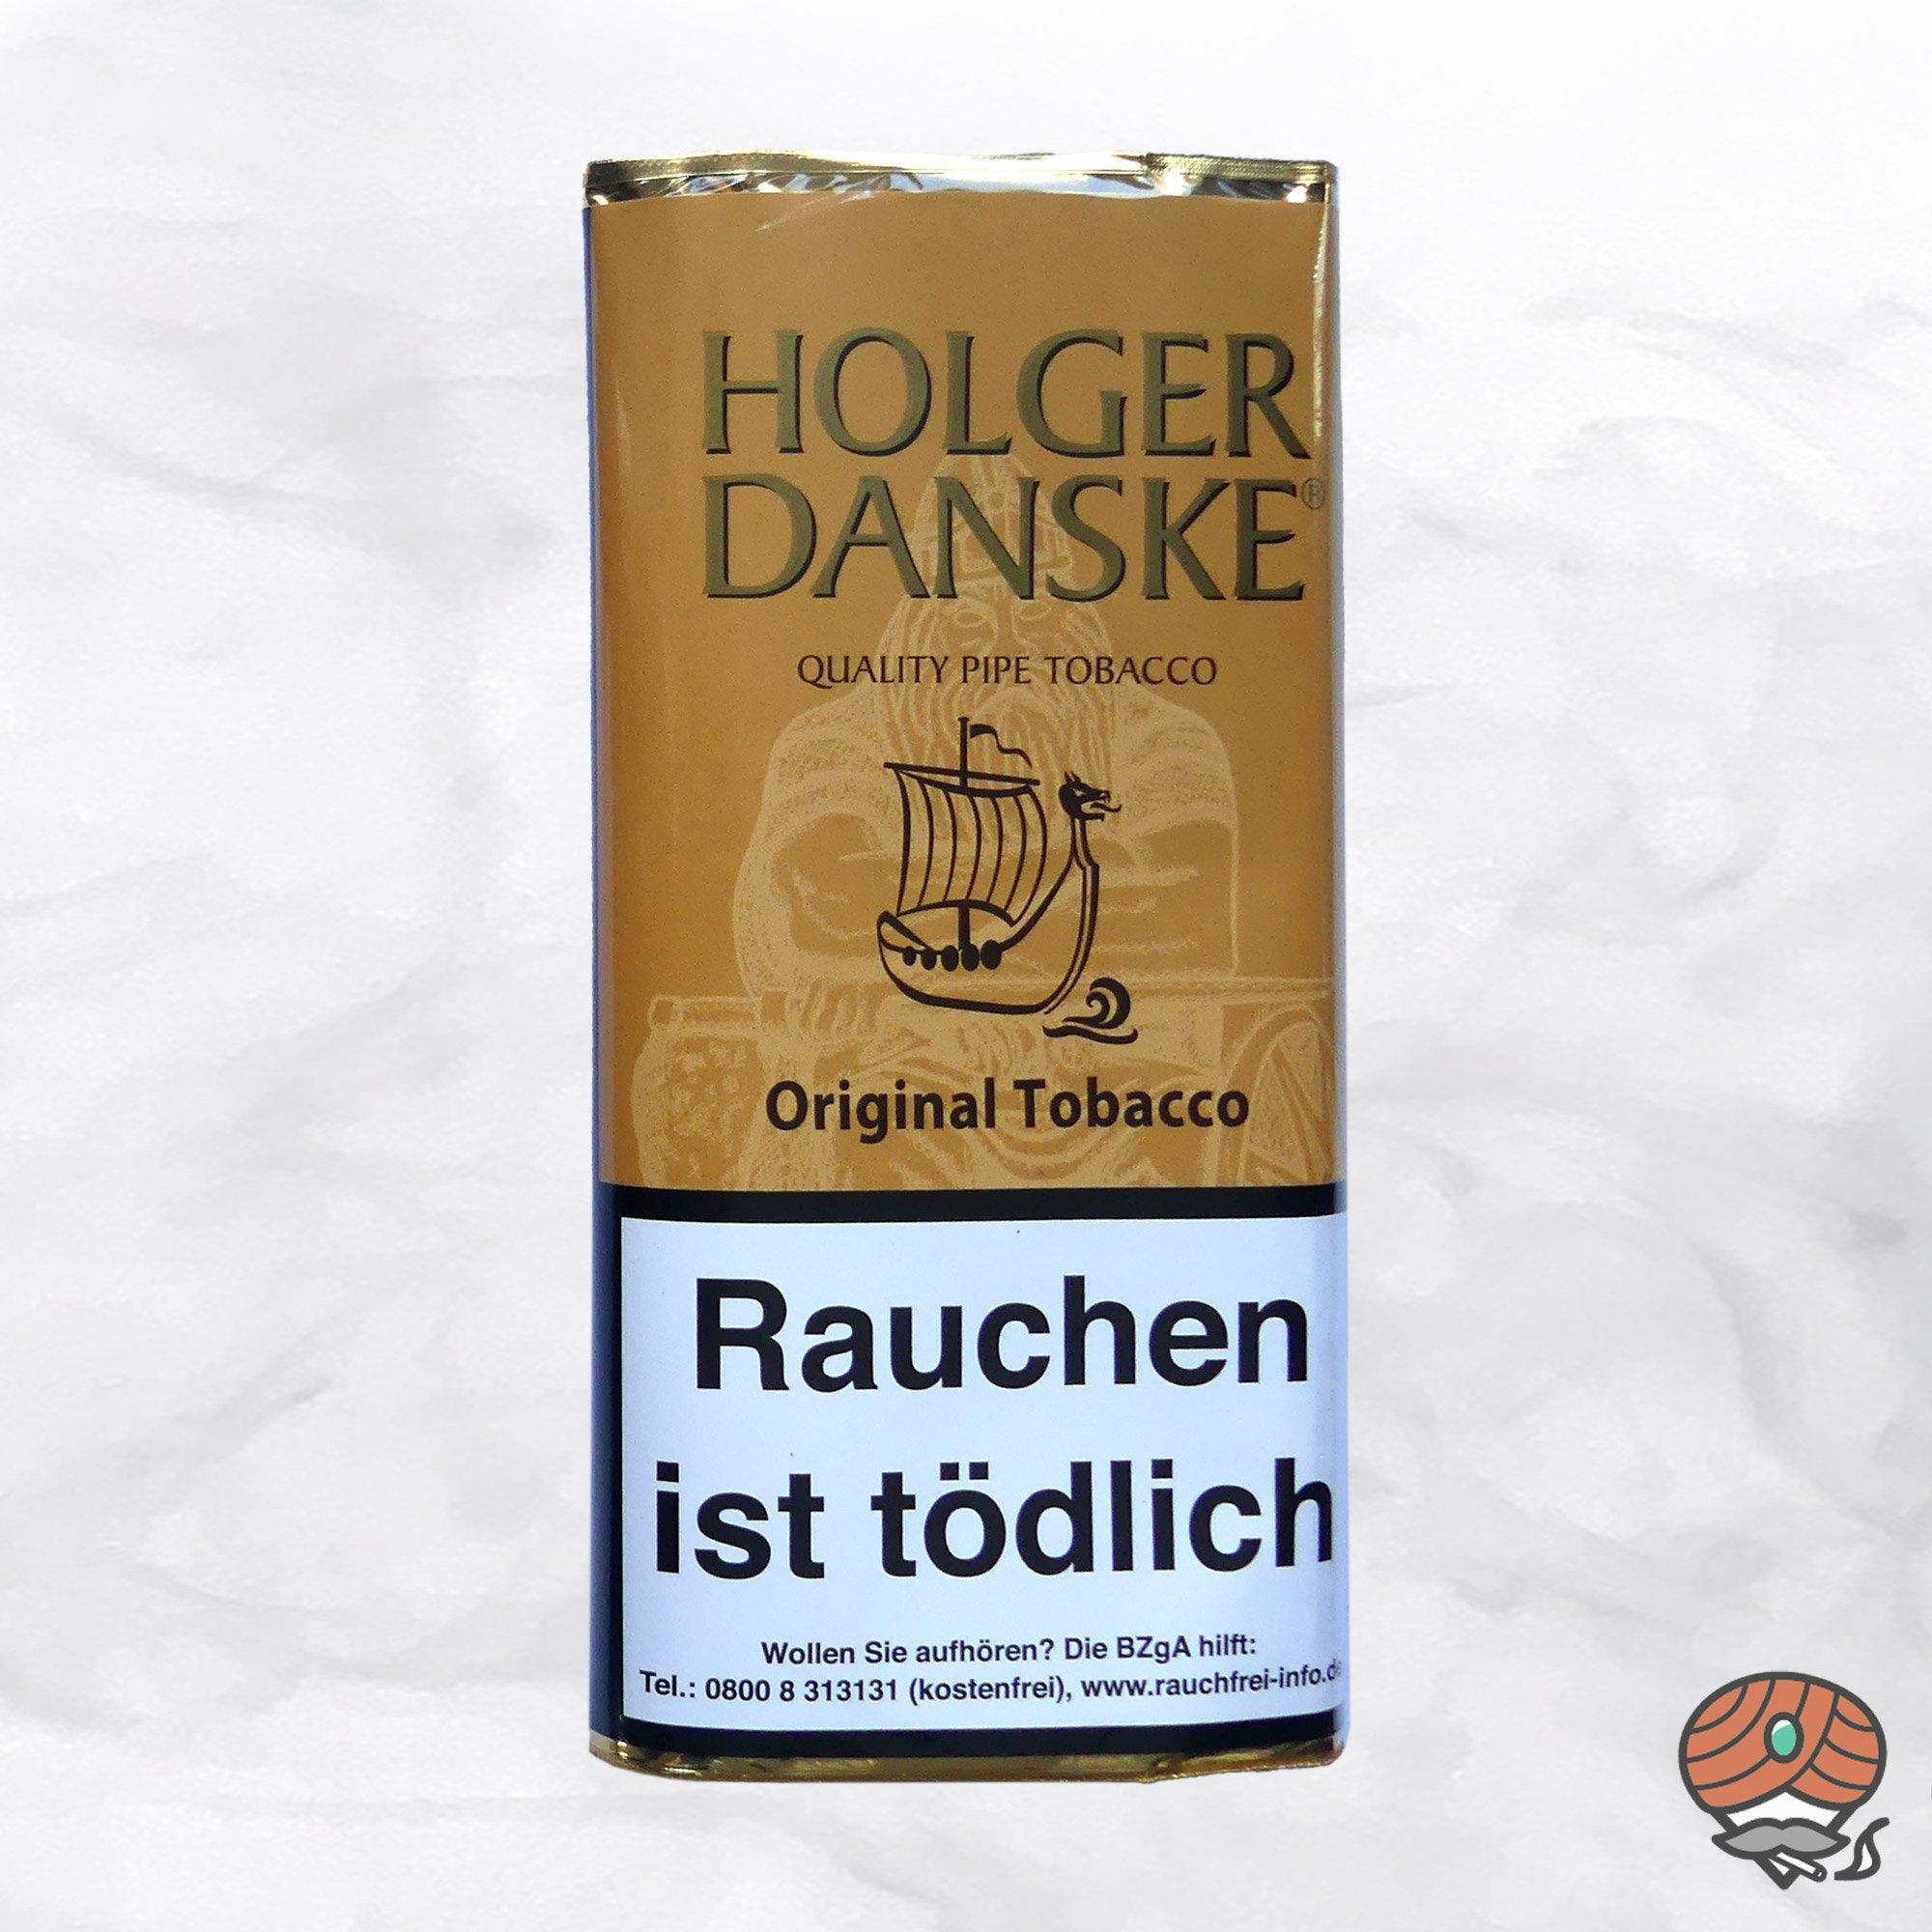 Holger Danske Original Tobacco Pfeifentabak 40 g Pouch